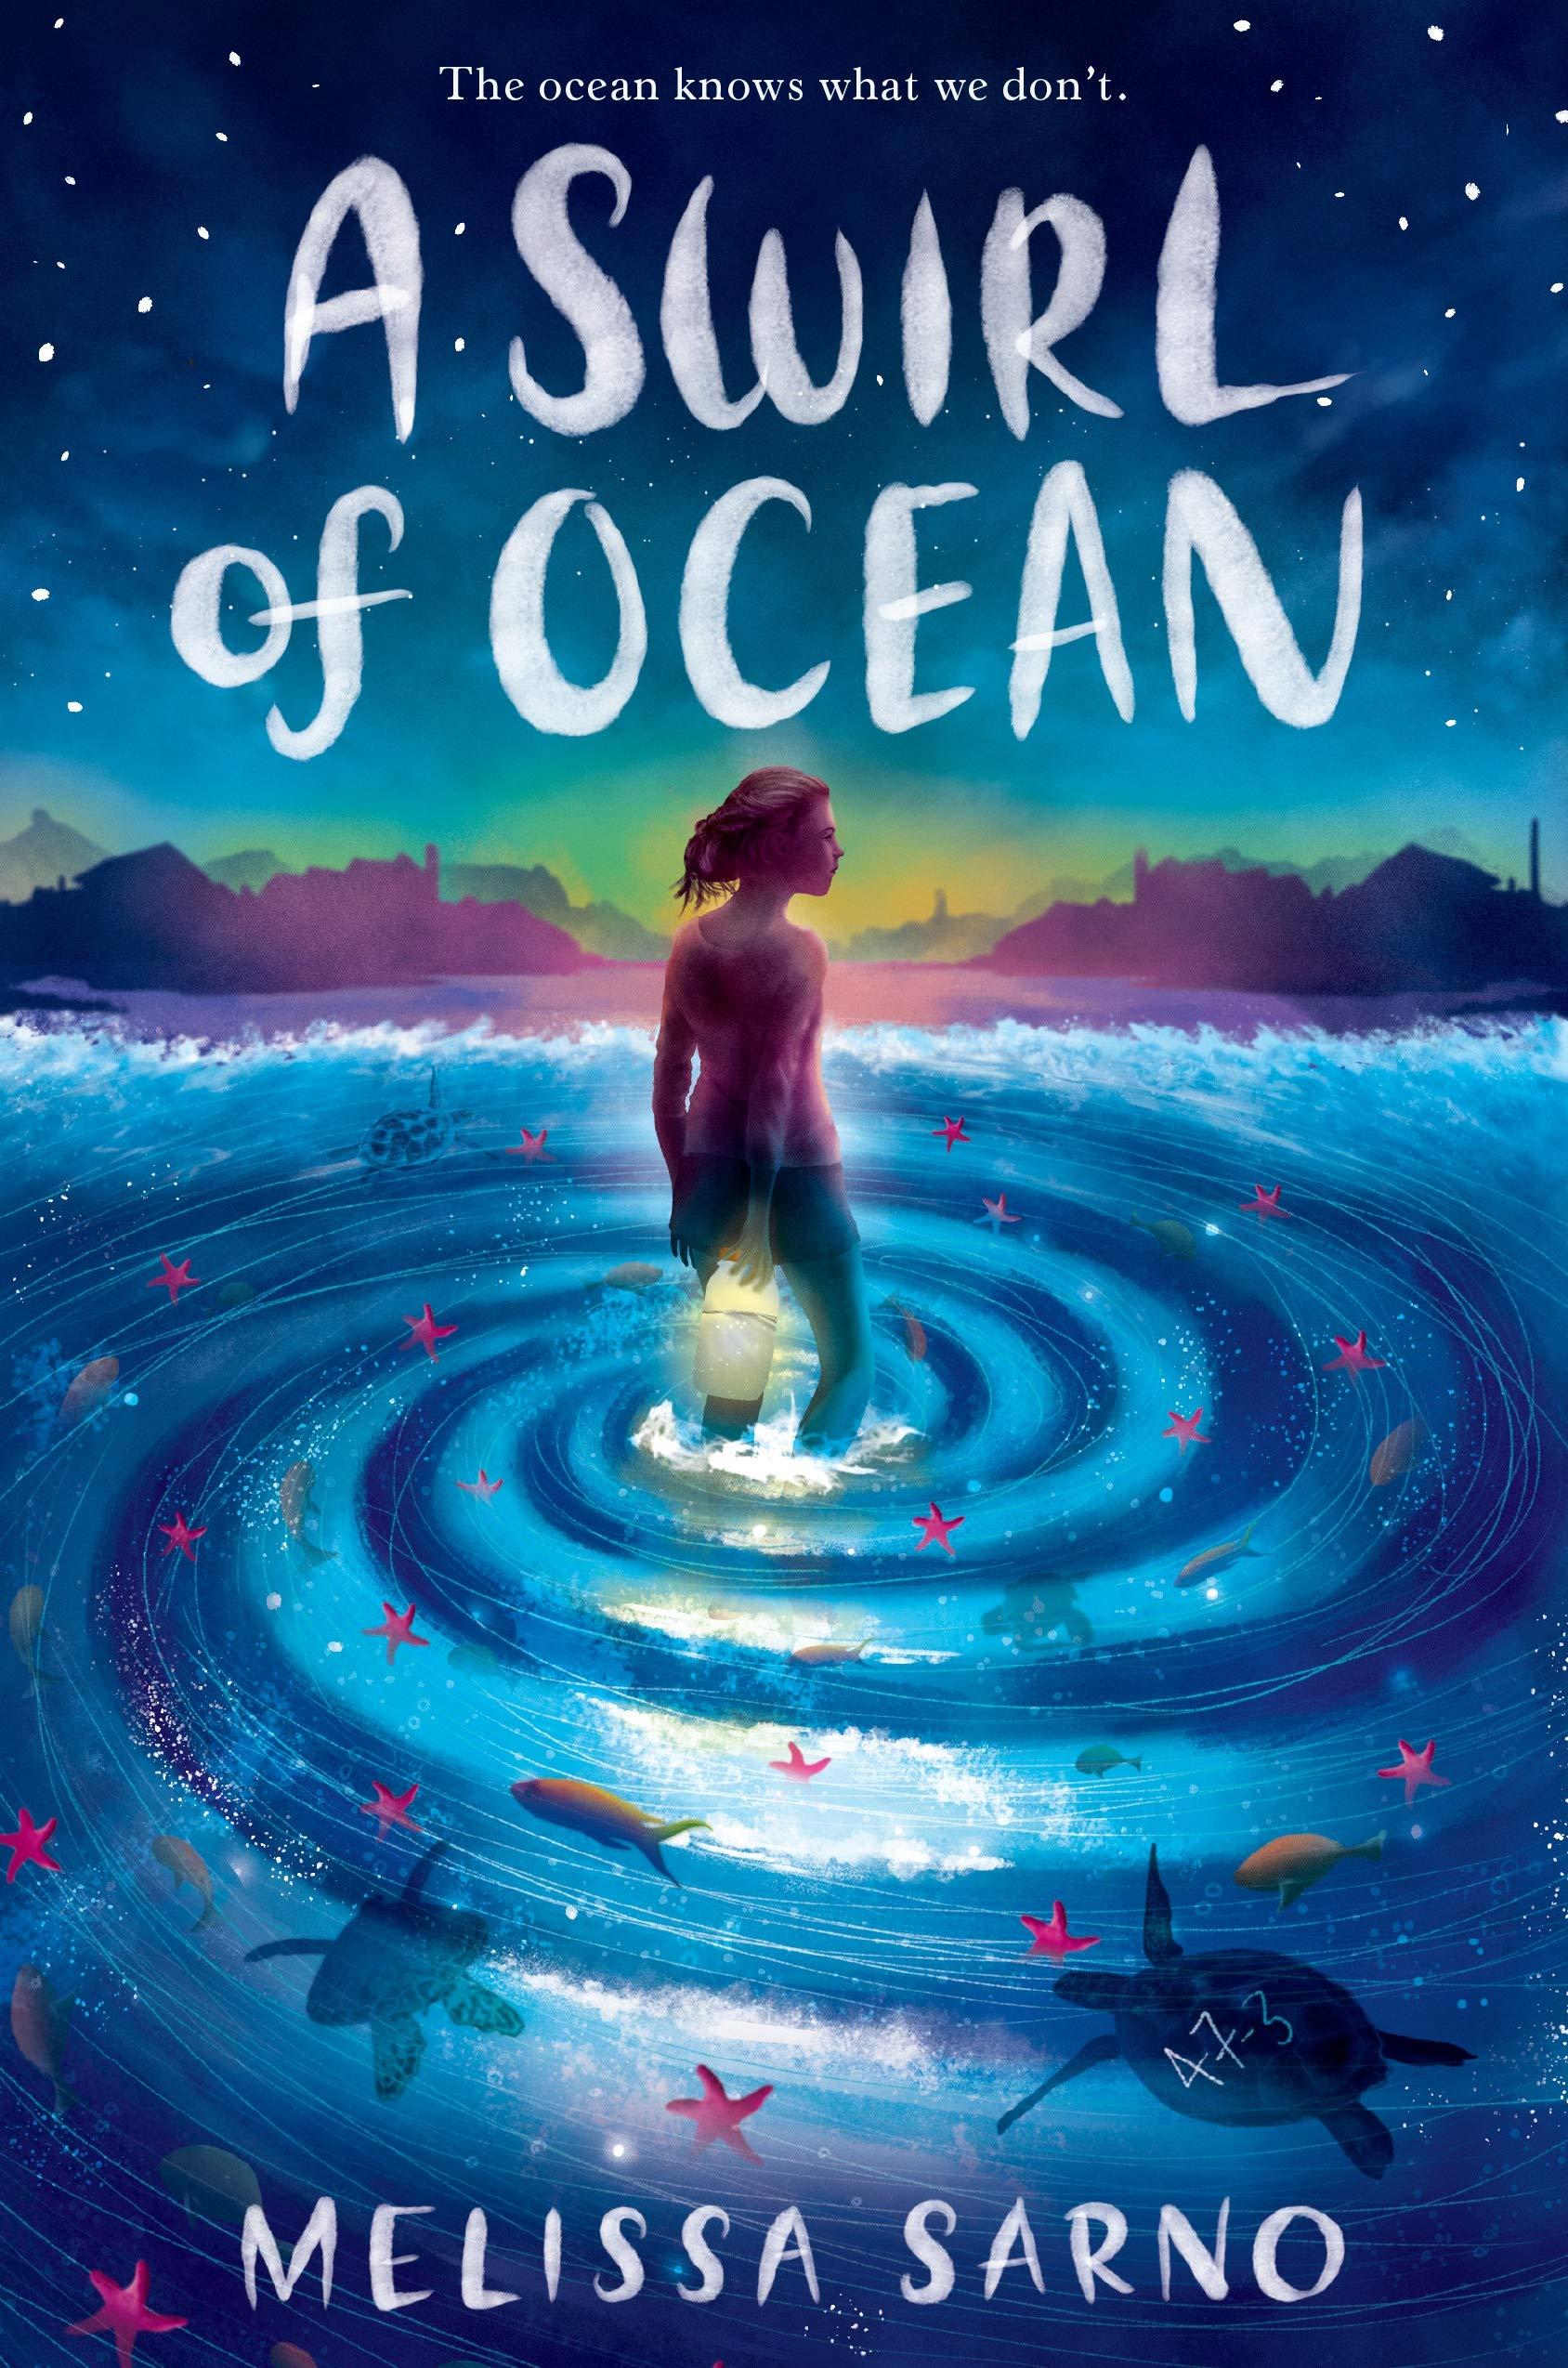 Image result for swirl of ocean book